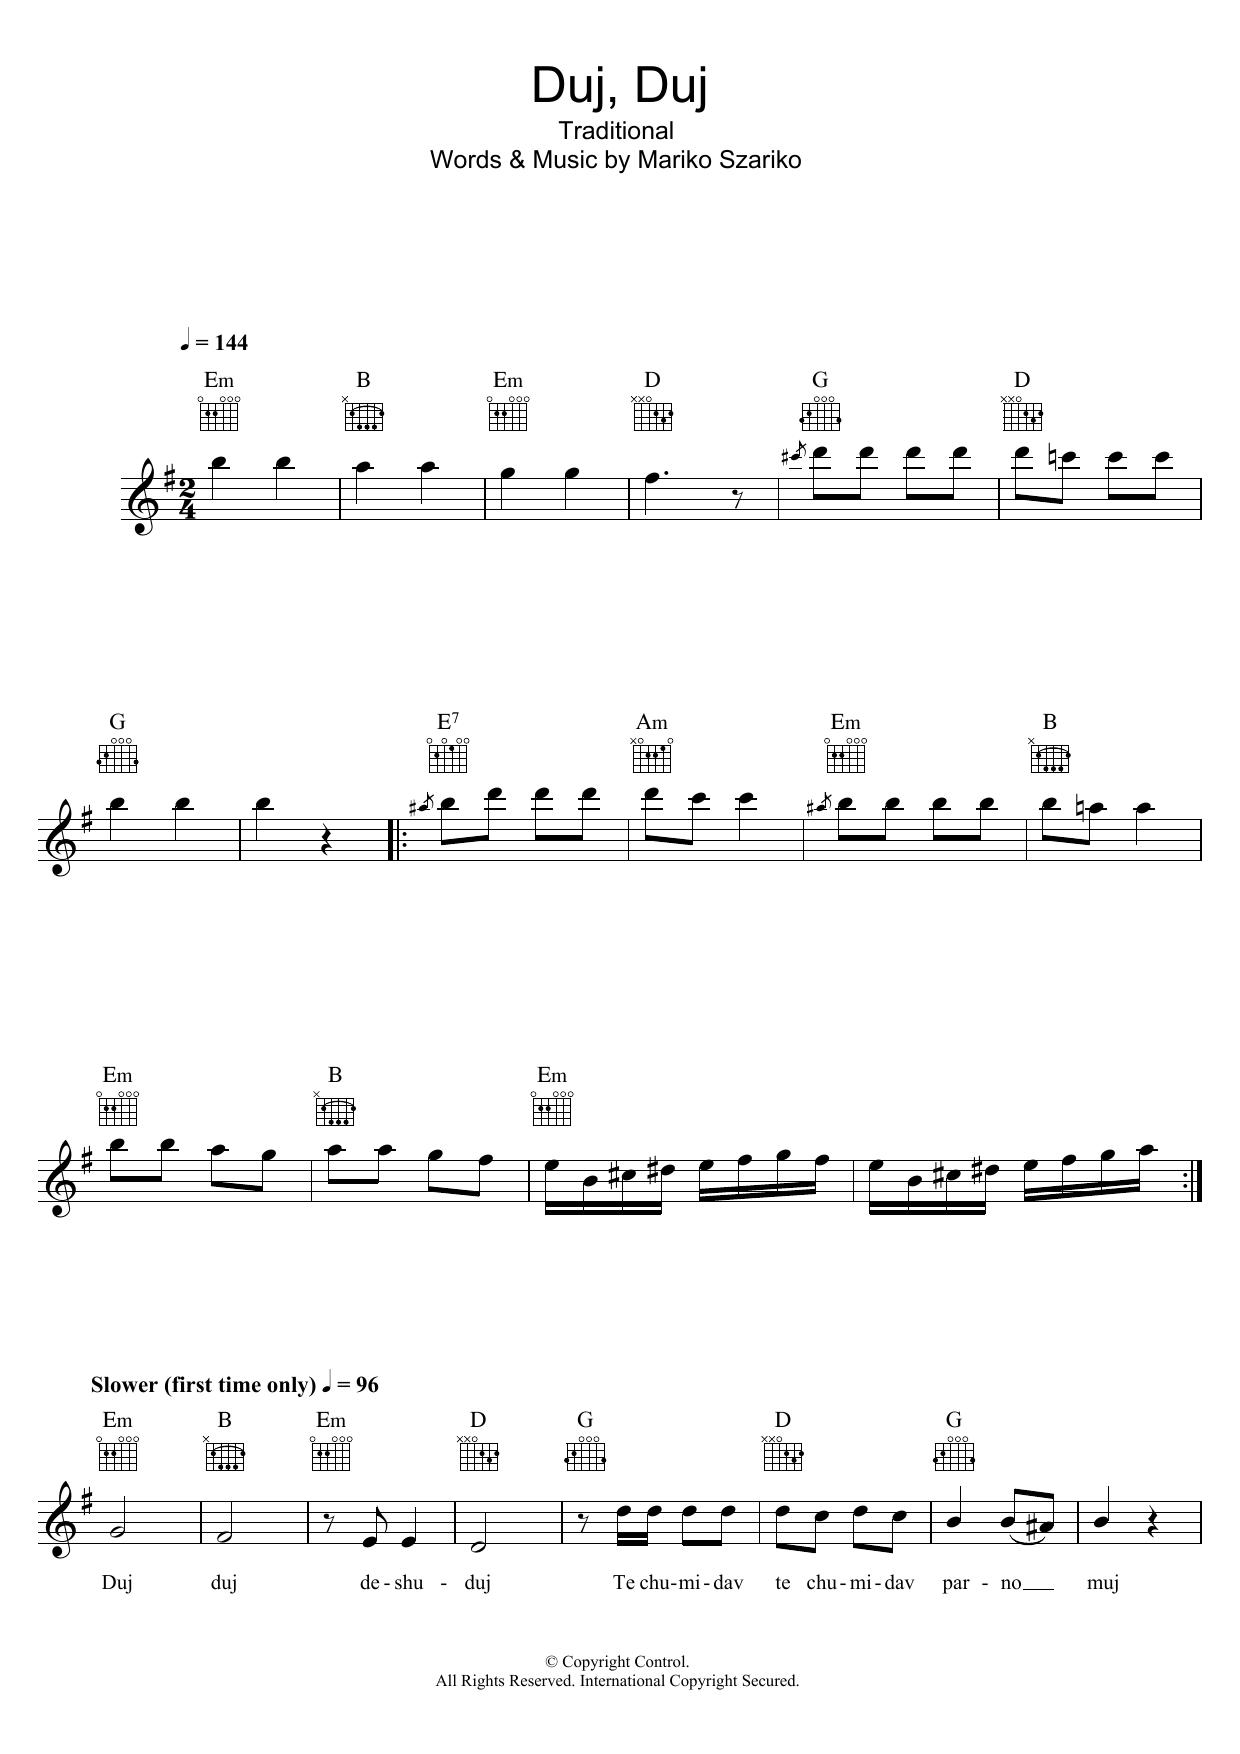 Traditional - Duj, Duj (Szariko Mariko)